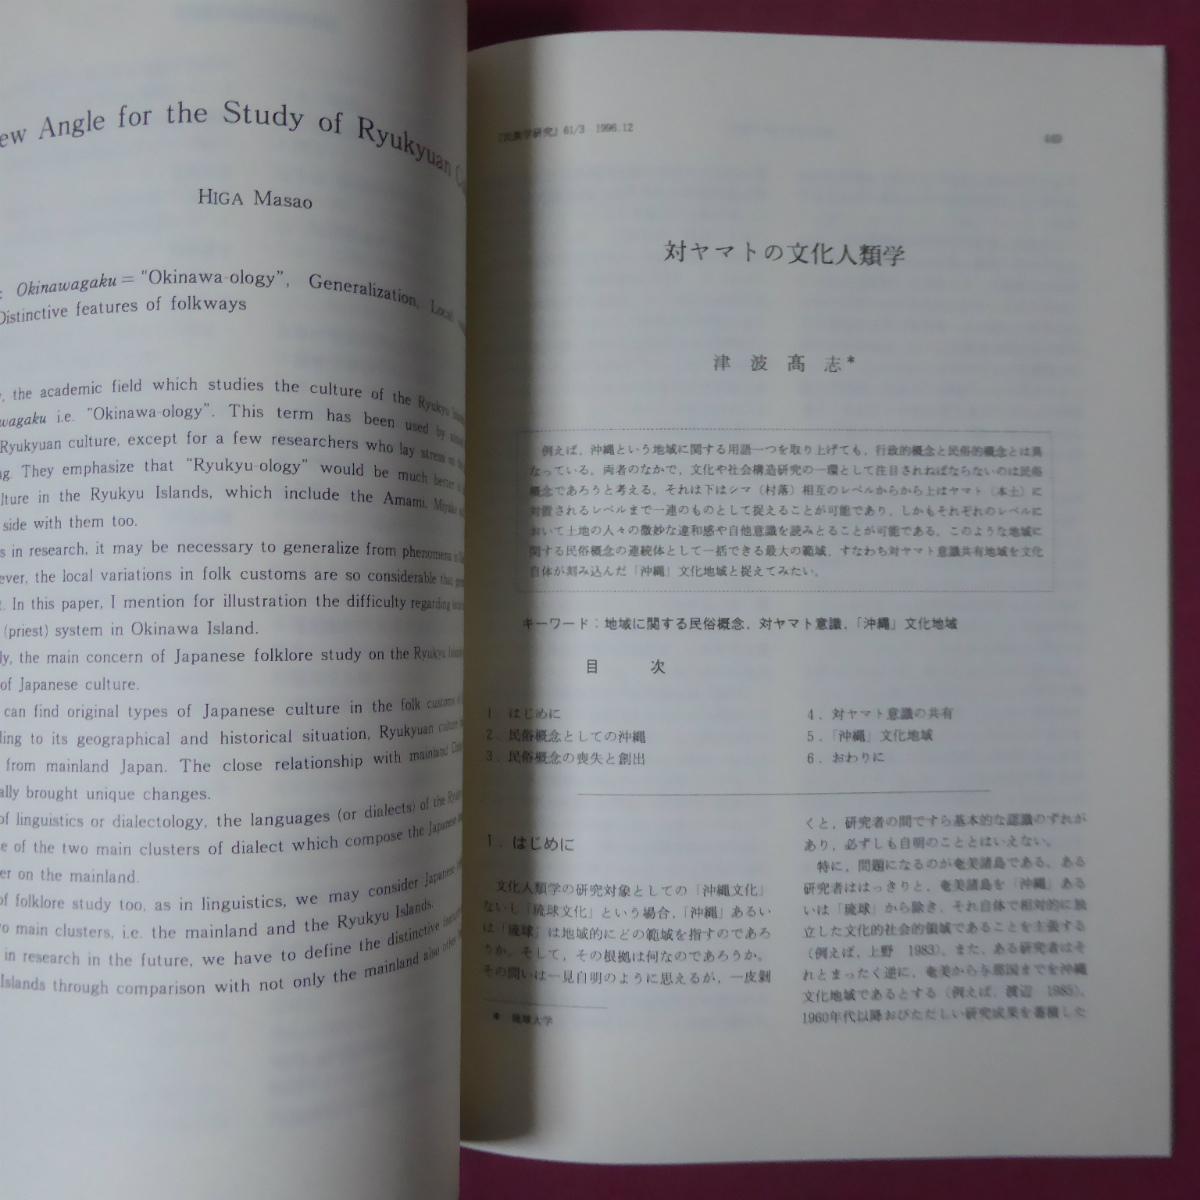 a11/ 民族學研究【「琉球」研究を求めて】在日韓国・朝鮮人の墓をめぐって/北西パキスタン・カラーシュ族の冬至祭り_画像10